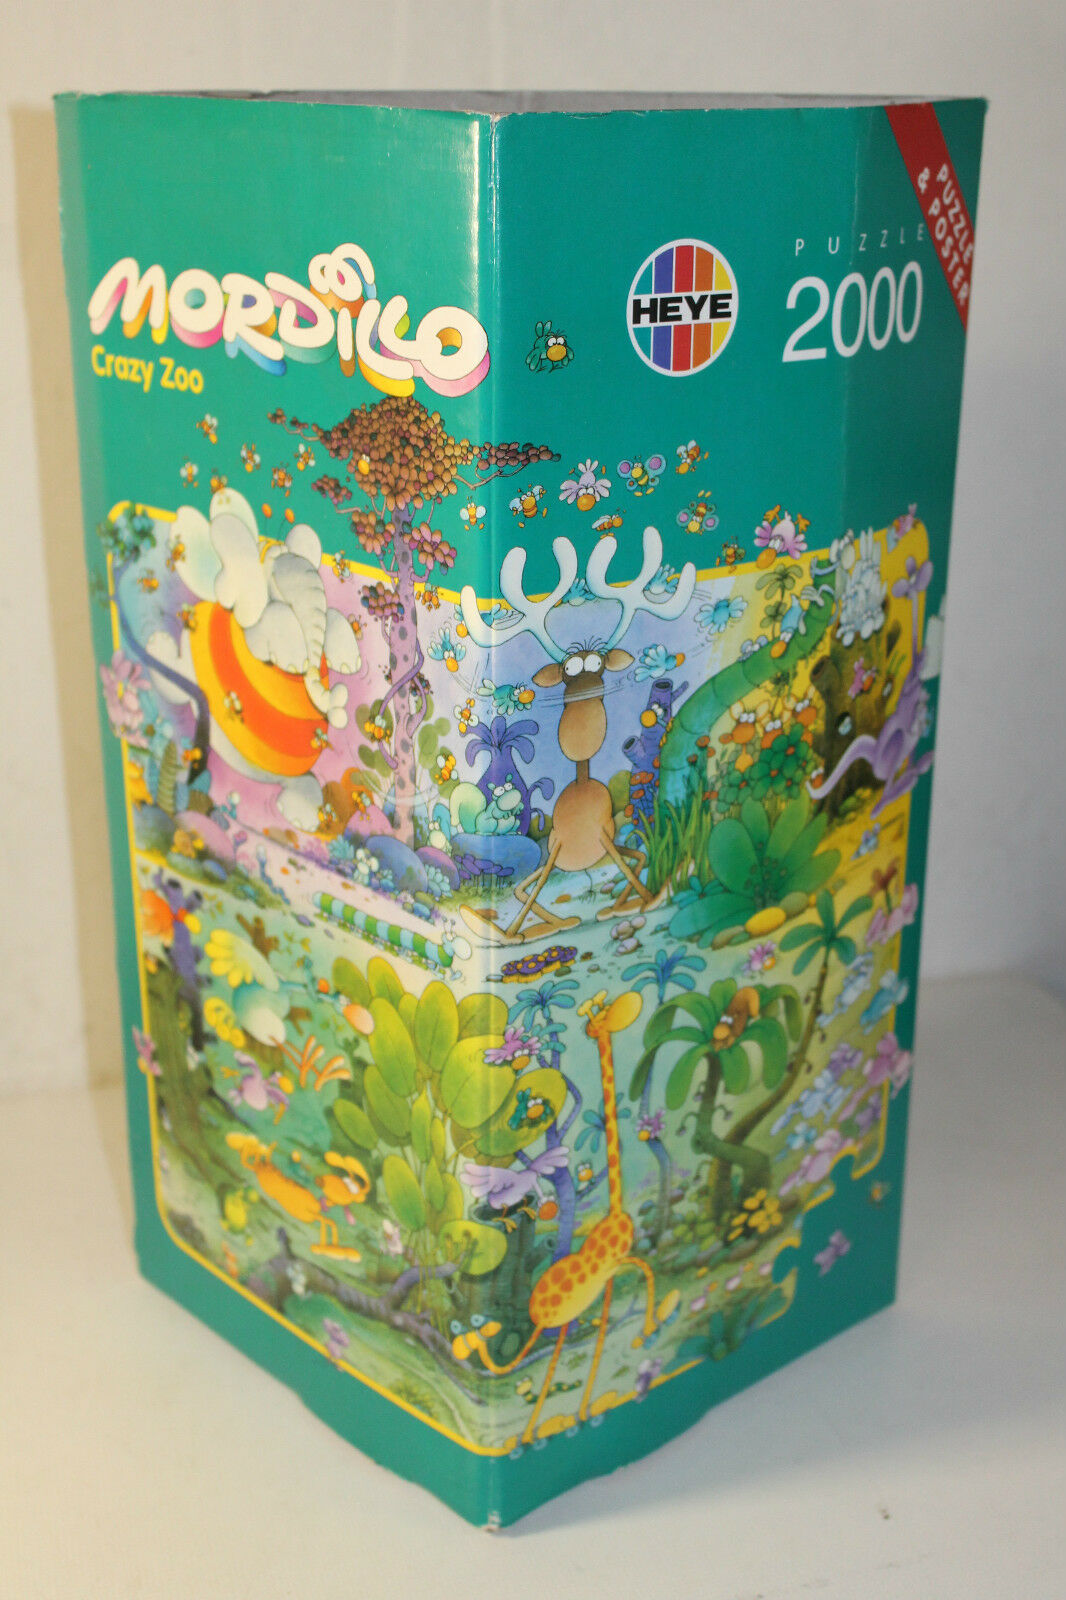 Heye Heye Heye 8659 Puzzle Mordillo Crazy Zoo 2000 teile OVP NEU + Poster RAR Sold Out c80a33